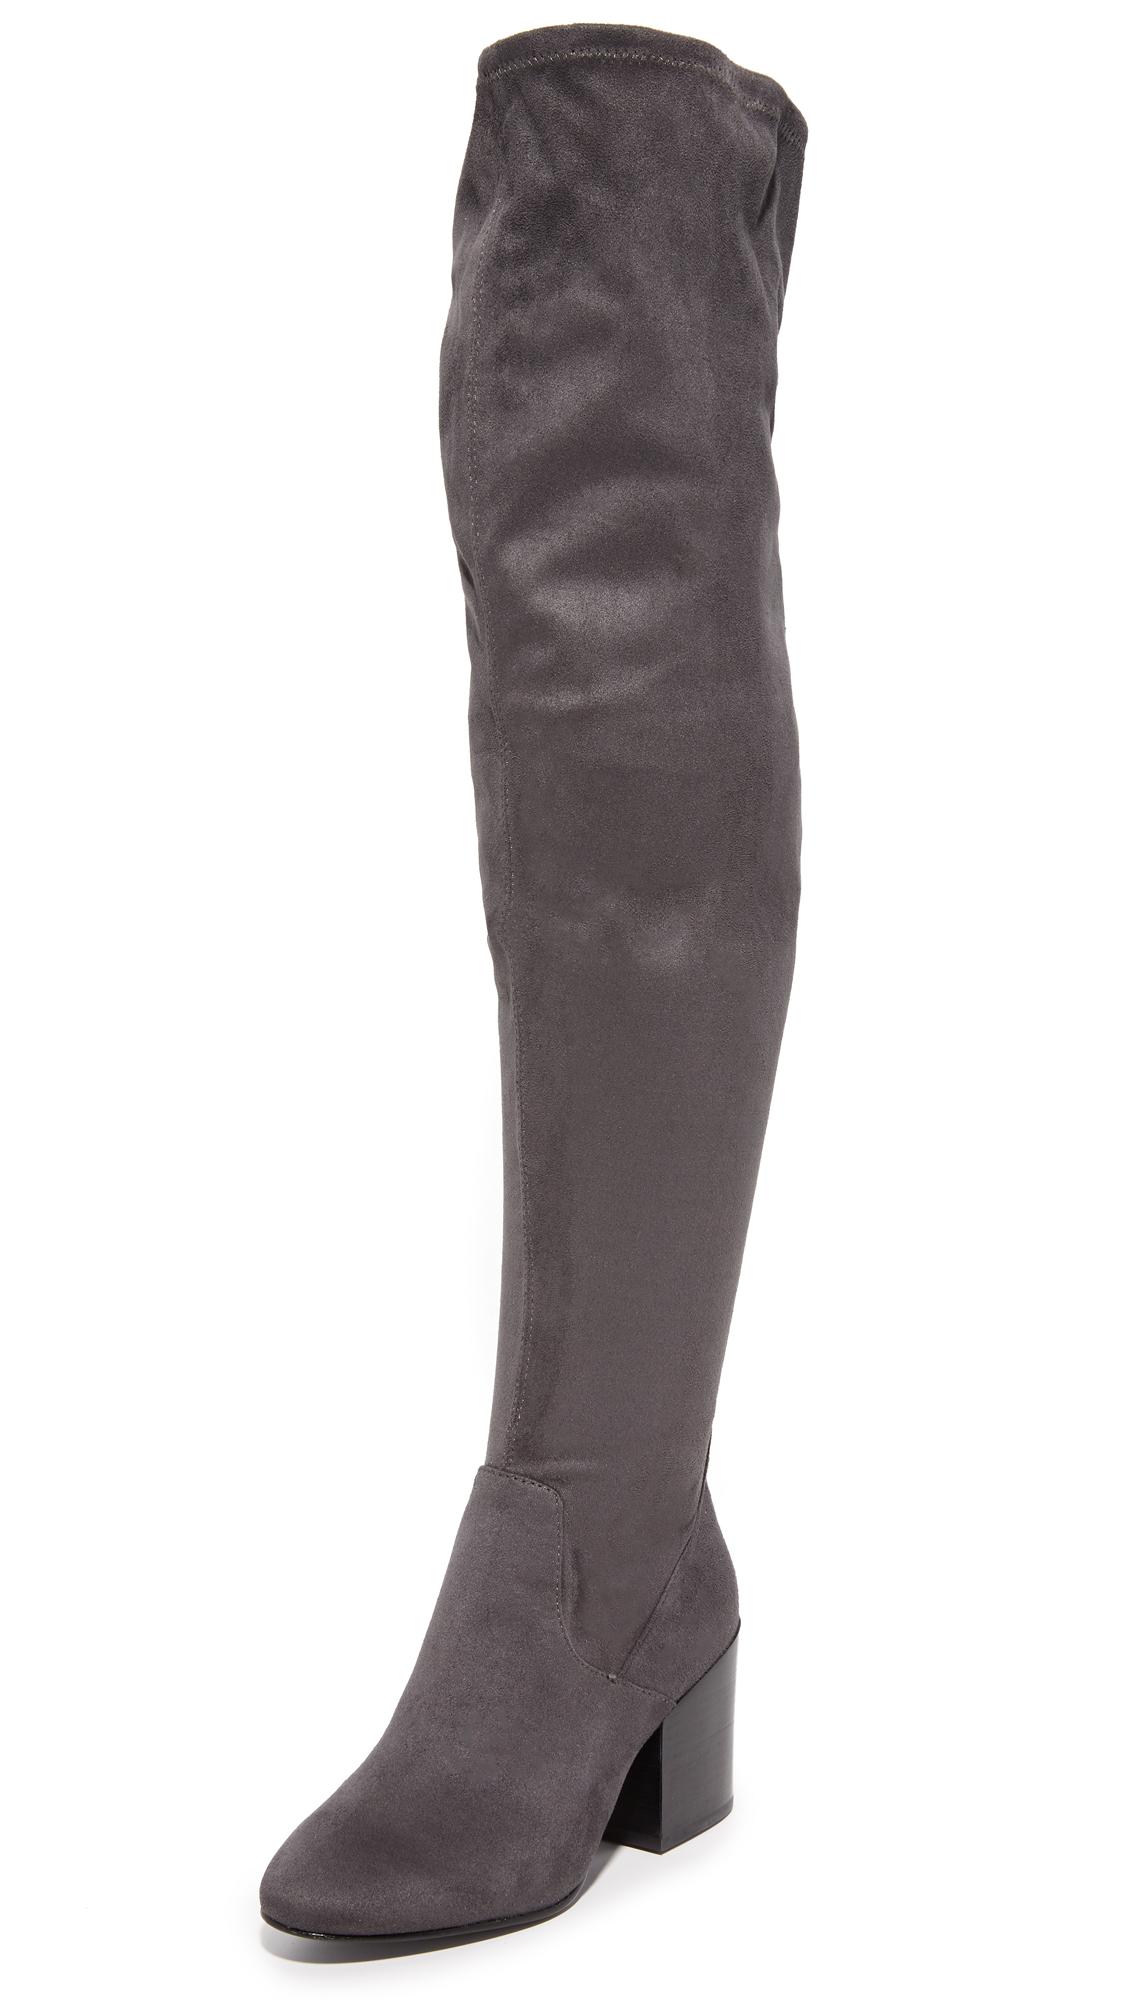 Ash Elisa Thigh High Boots - Bistro